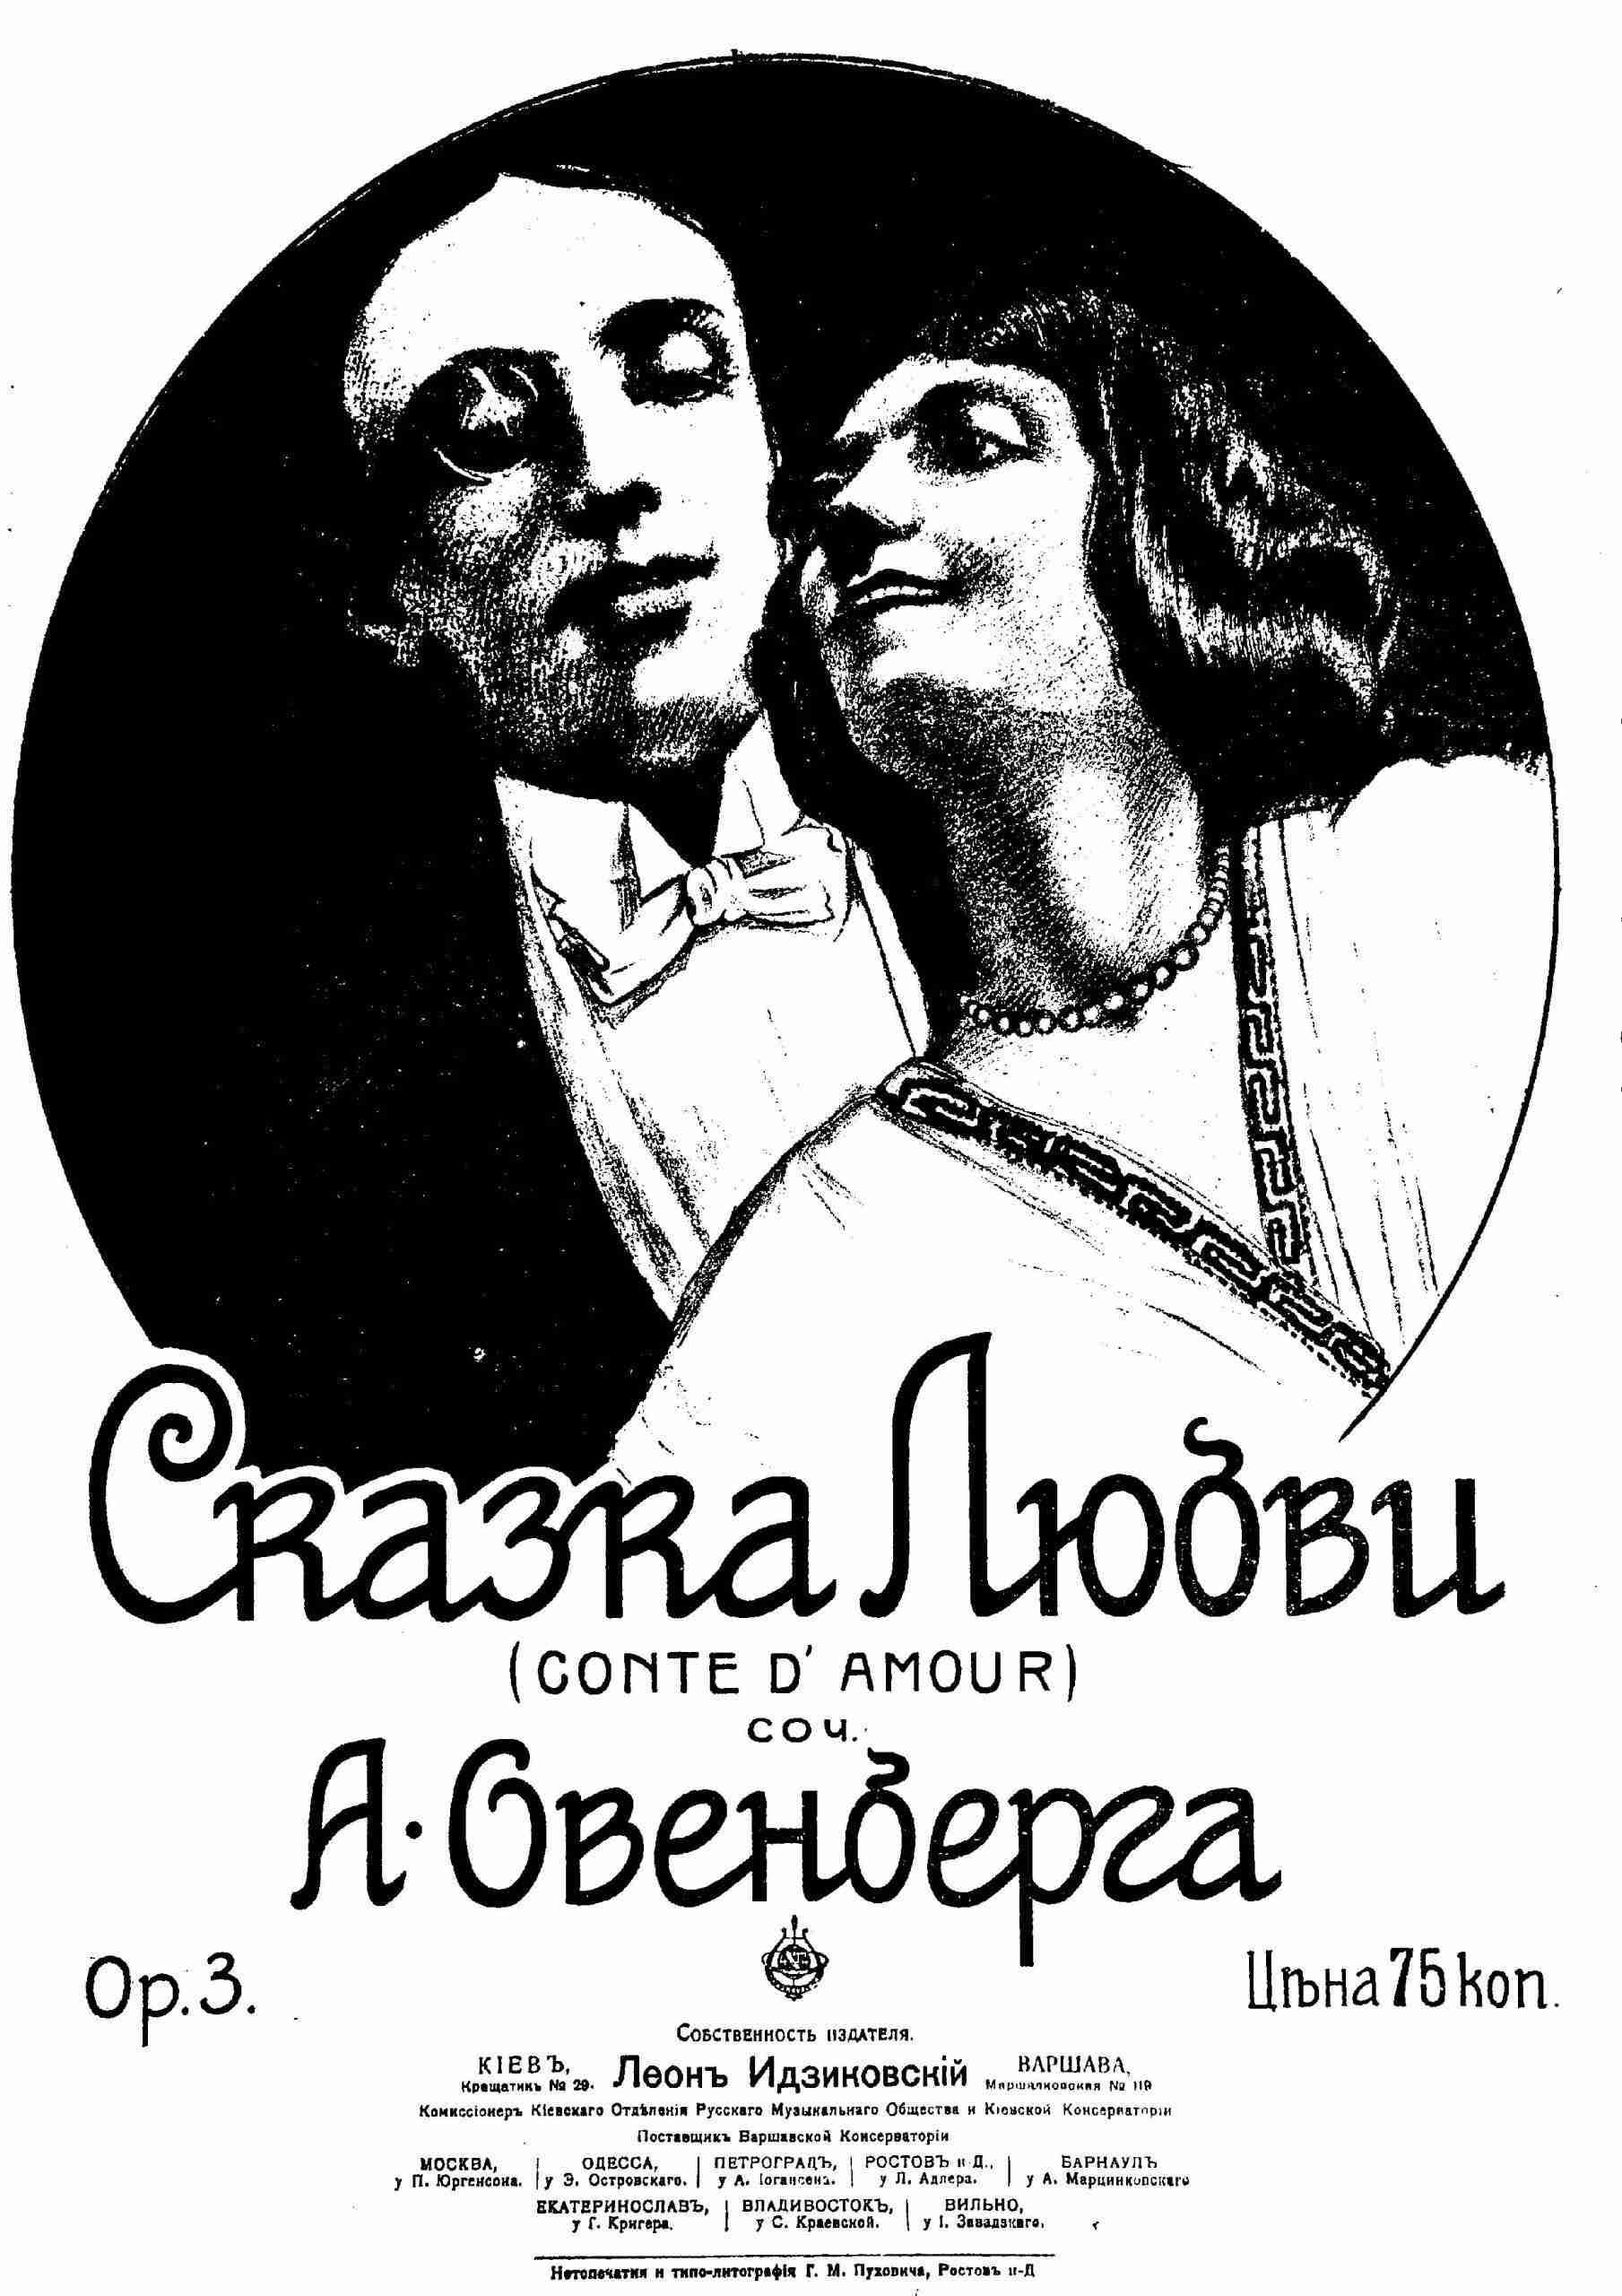 Prisovsky, Vasily - Conte d'Amour, Op.3